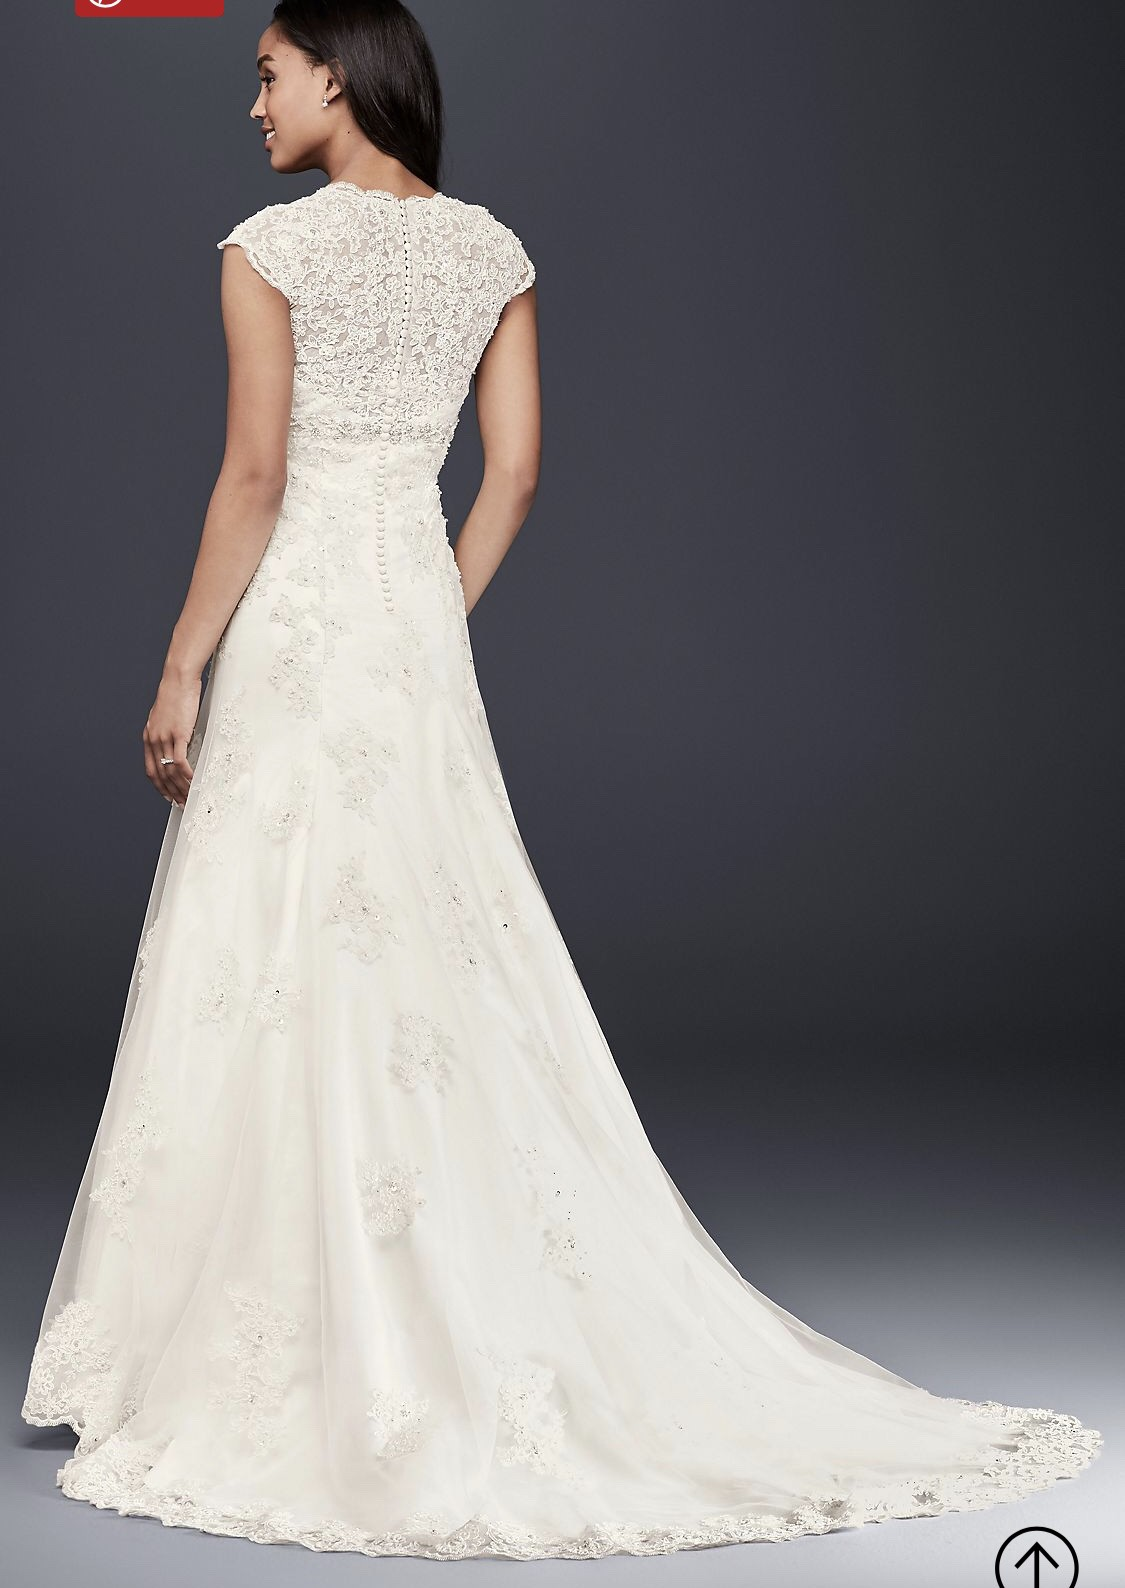 Davids Bridal Cap Sleeve Lace Over Satin Wedding Dress Wedding Dress On Sale 76 Off